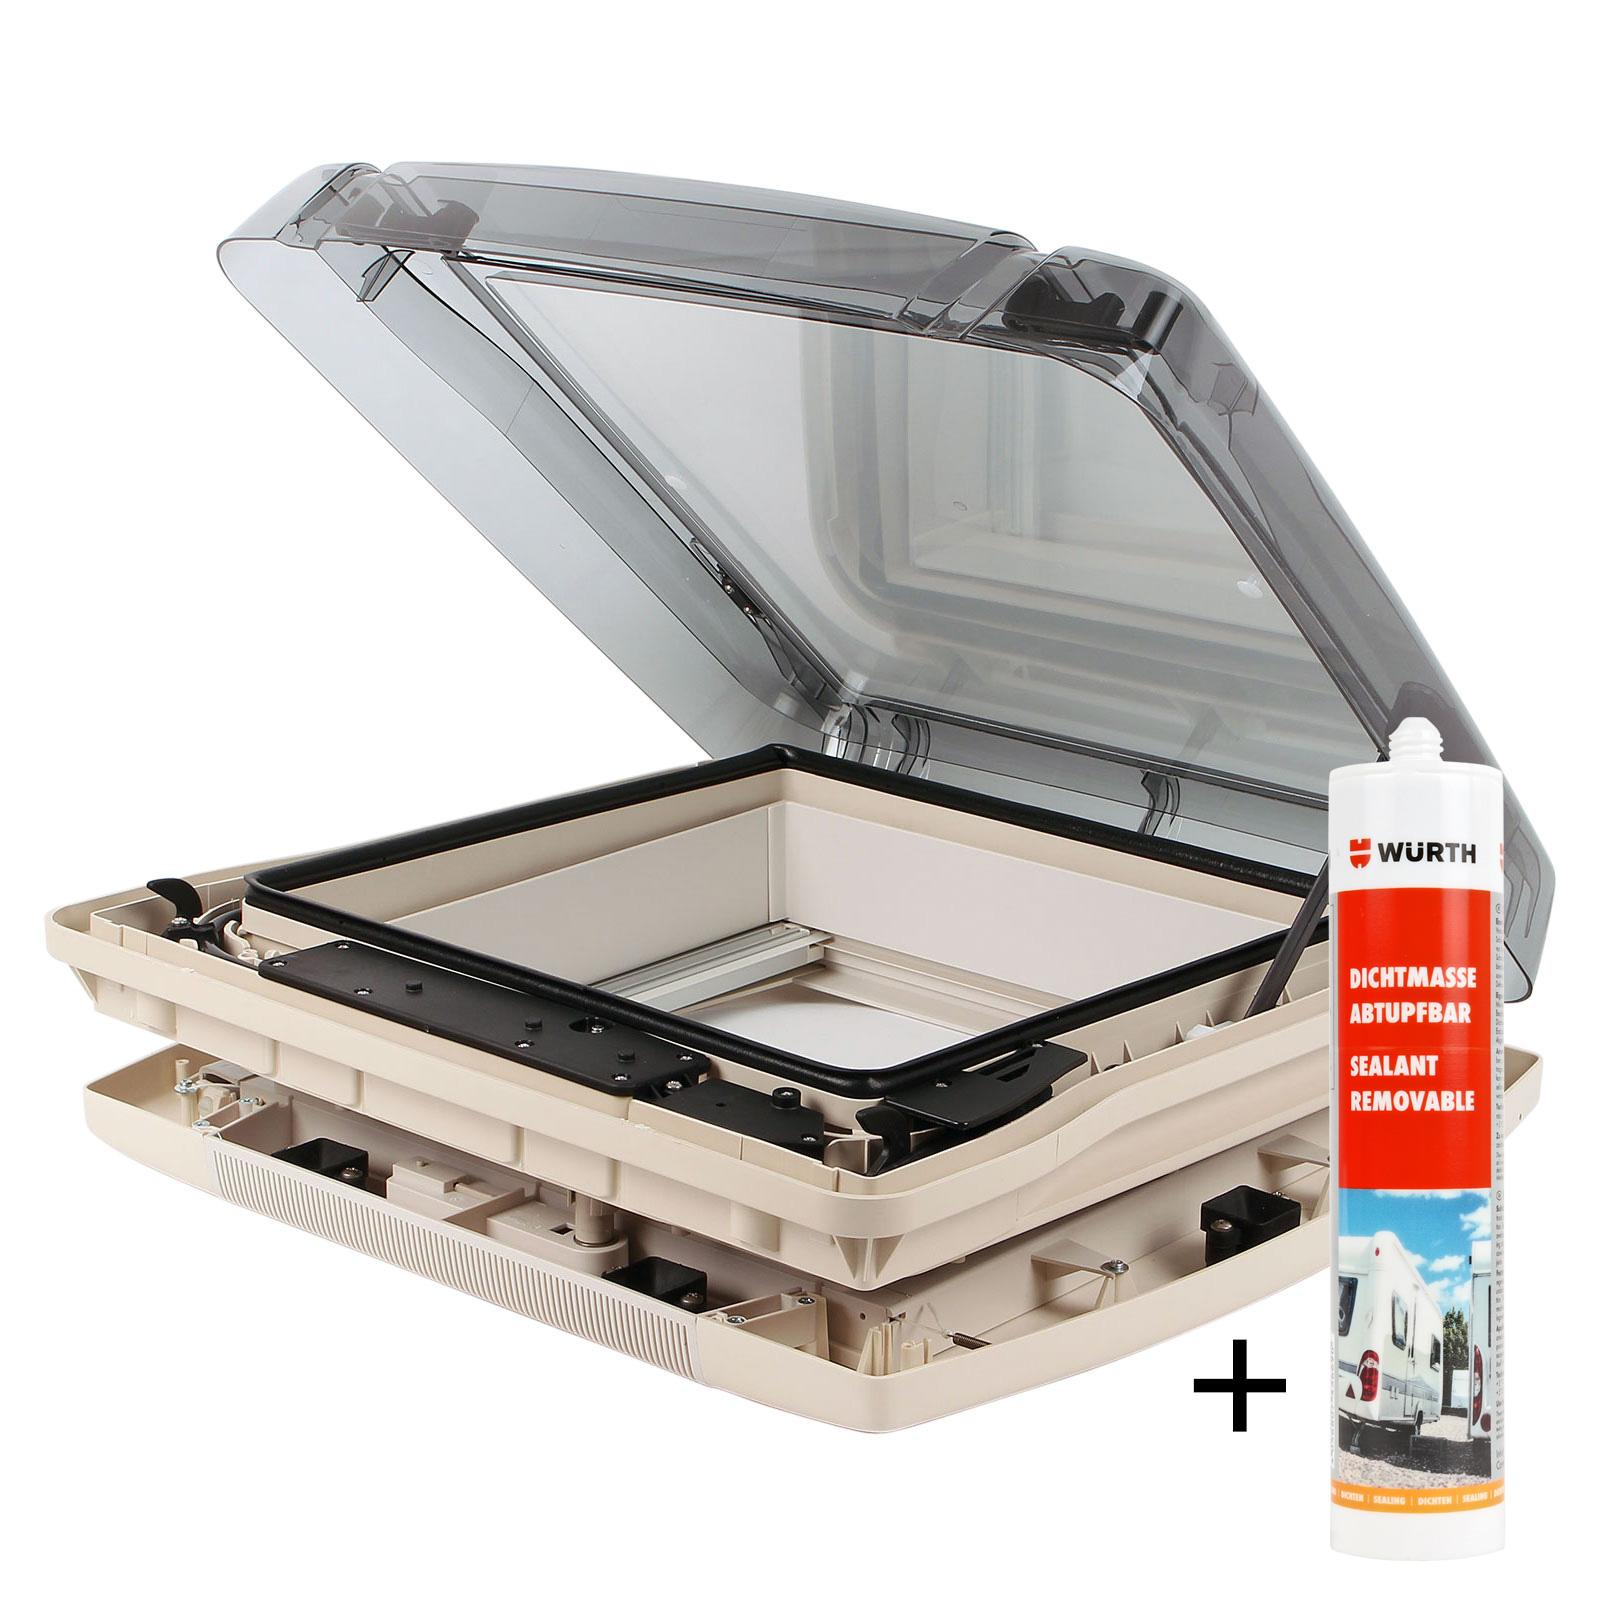 Dachfenster Remis Remitop Vario II Kurbelvariante 40 x 40 cm klar + Dichtmasse